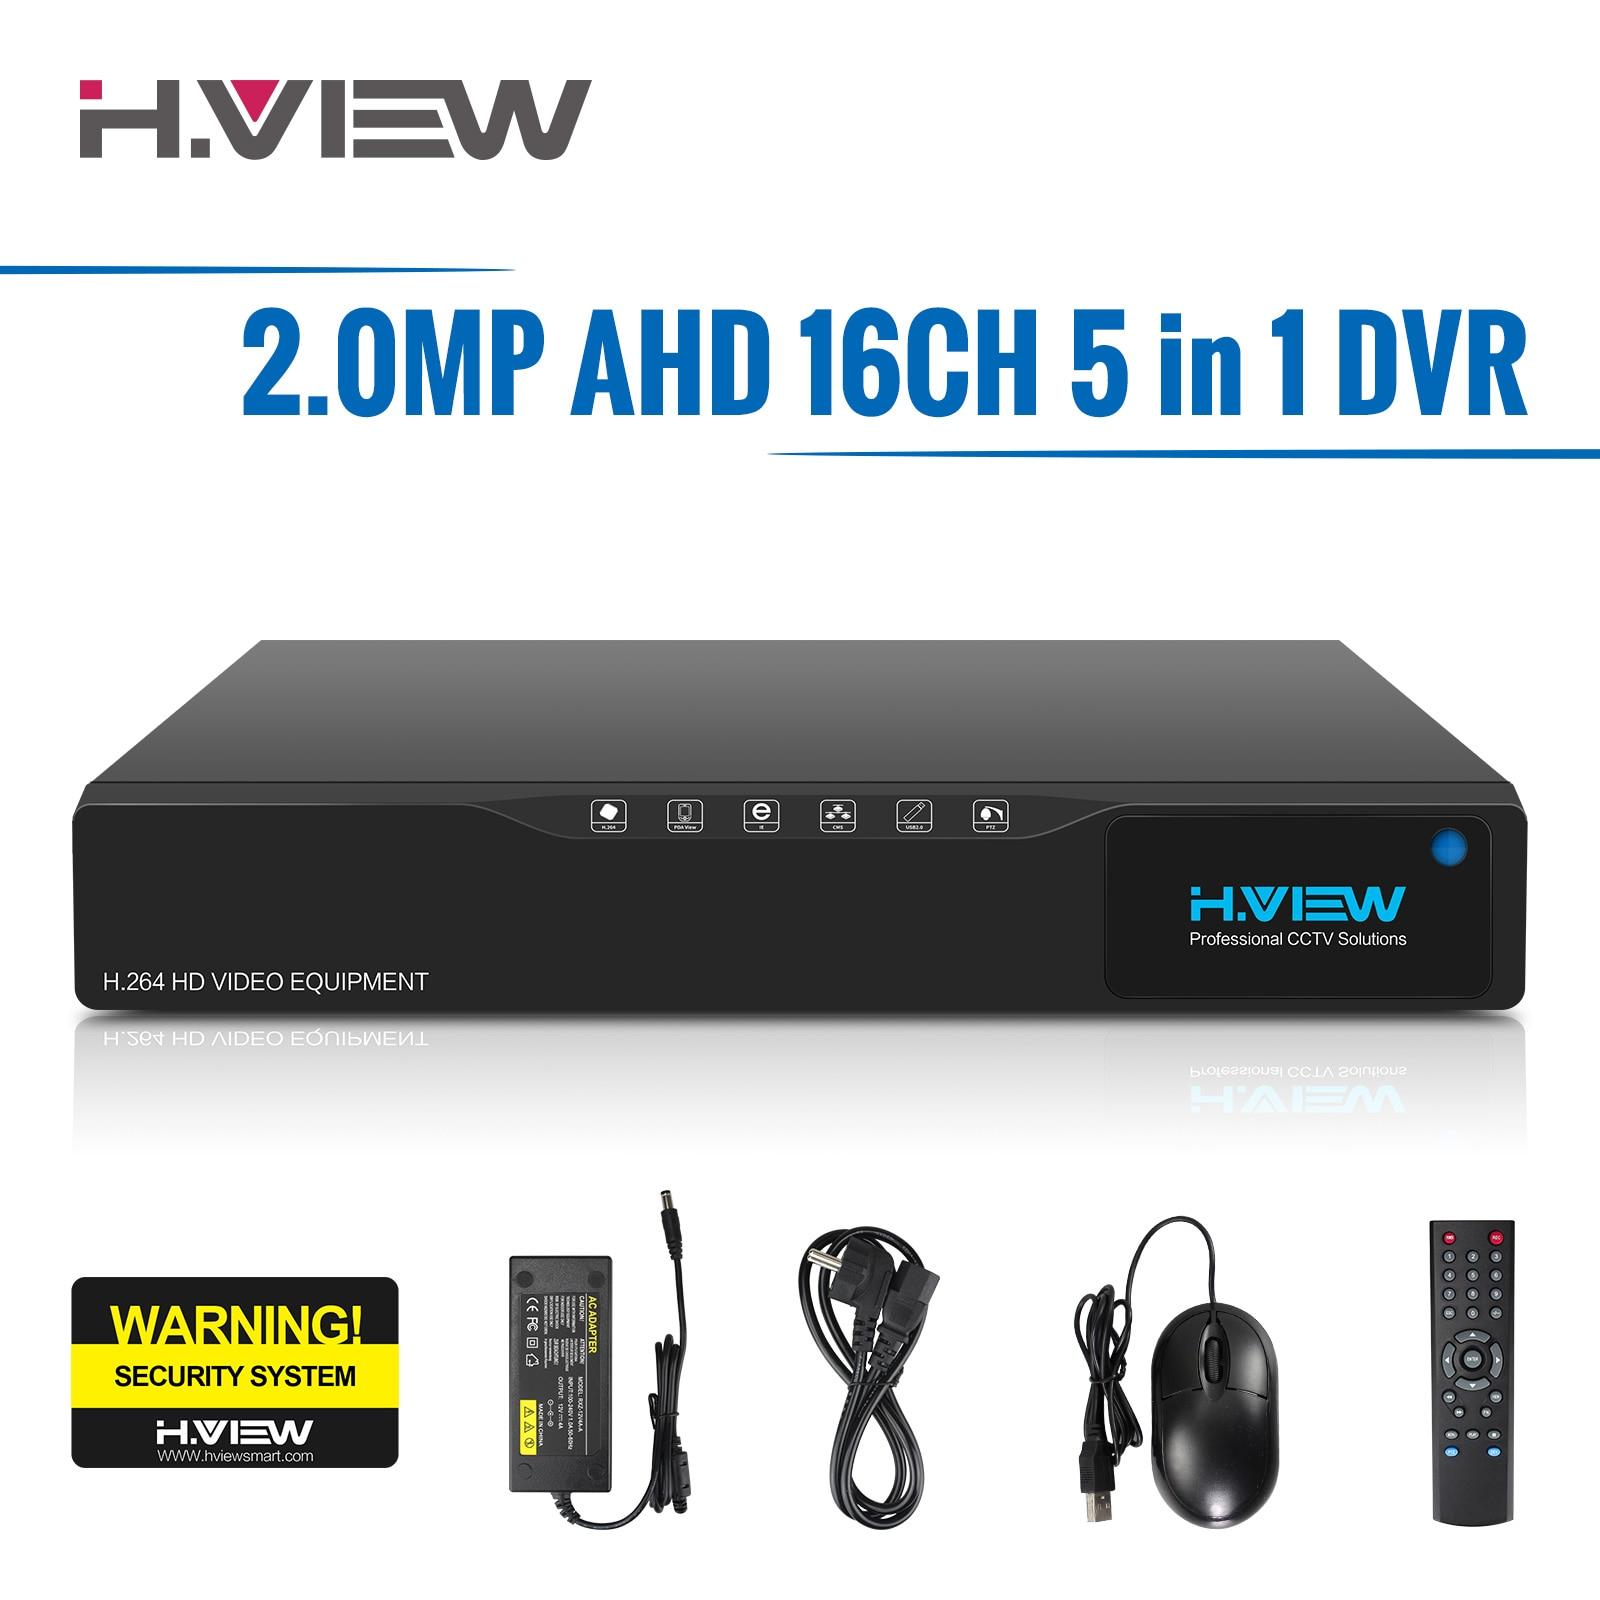 цена на 16 CH 1080P CCTV DVR Recorder H.264 HDMI Network Digital Video Recorder AHD CCTV Camera For Home Security System